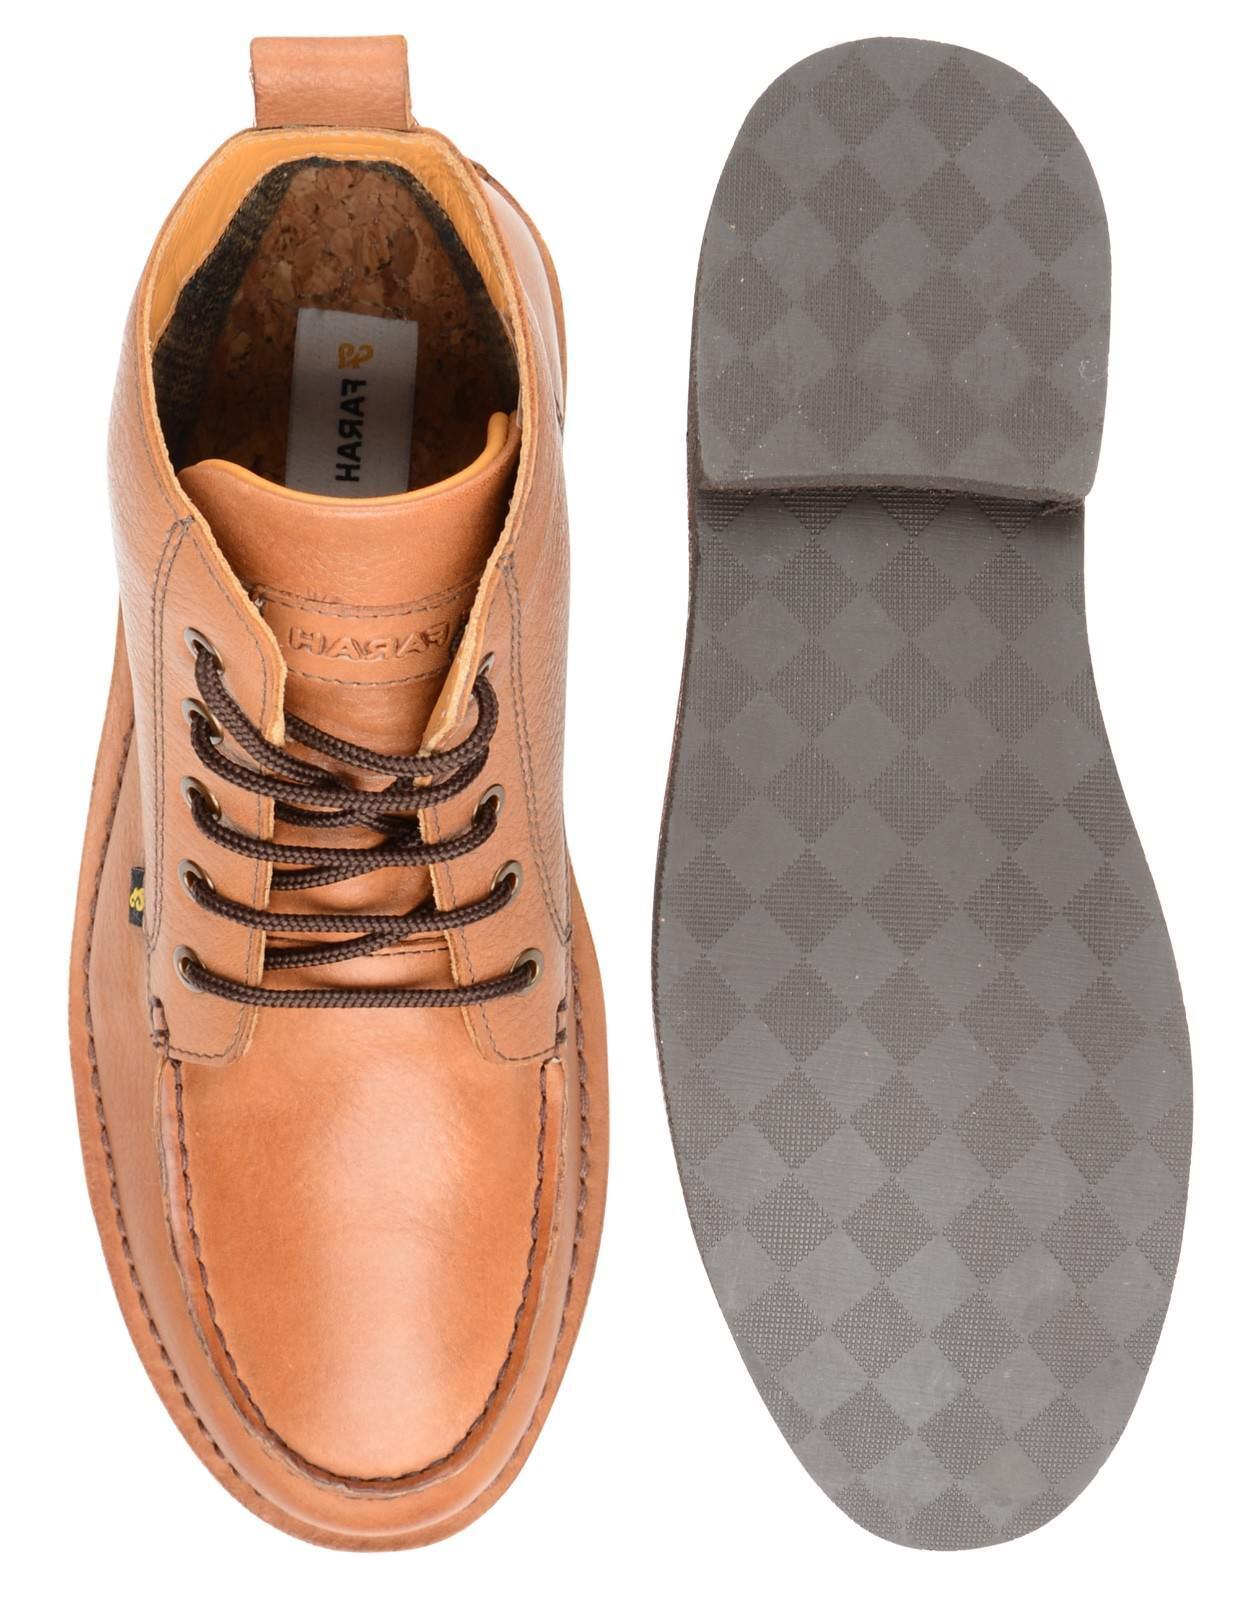 Farah Vintage Osten Leder Wüstenstiefel Wüstenstiefel Wüstenstiefel  Herren-Tan Freizeitschuhe Stiefel c00f8d